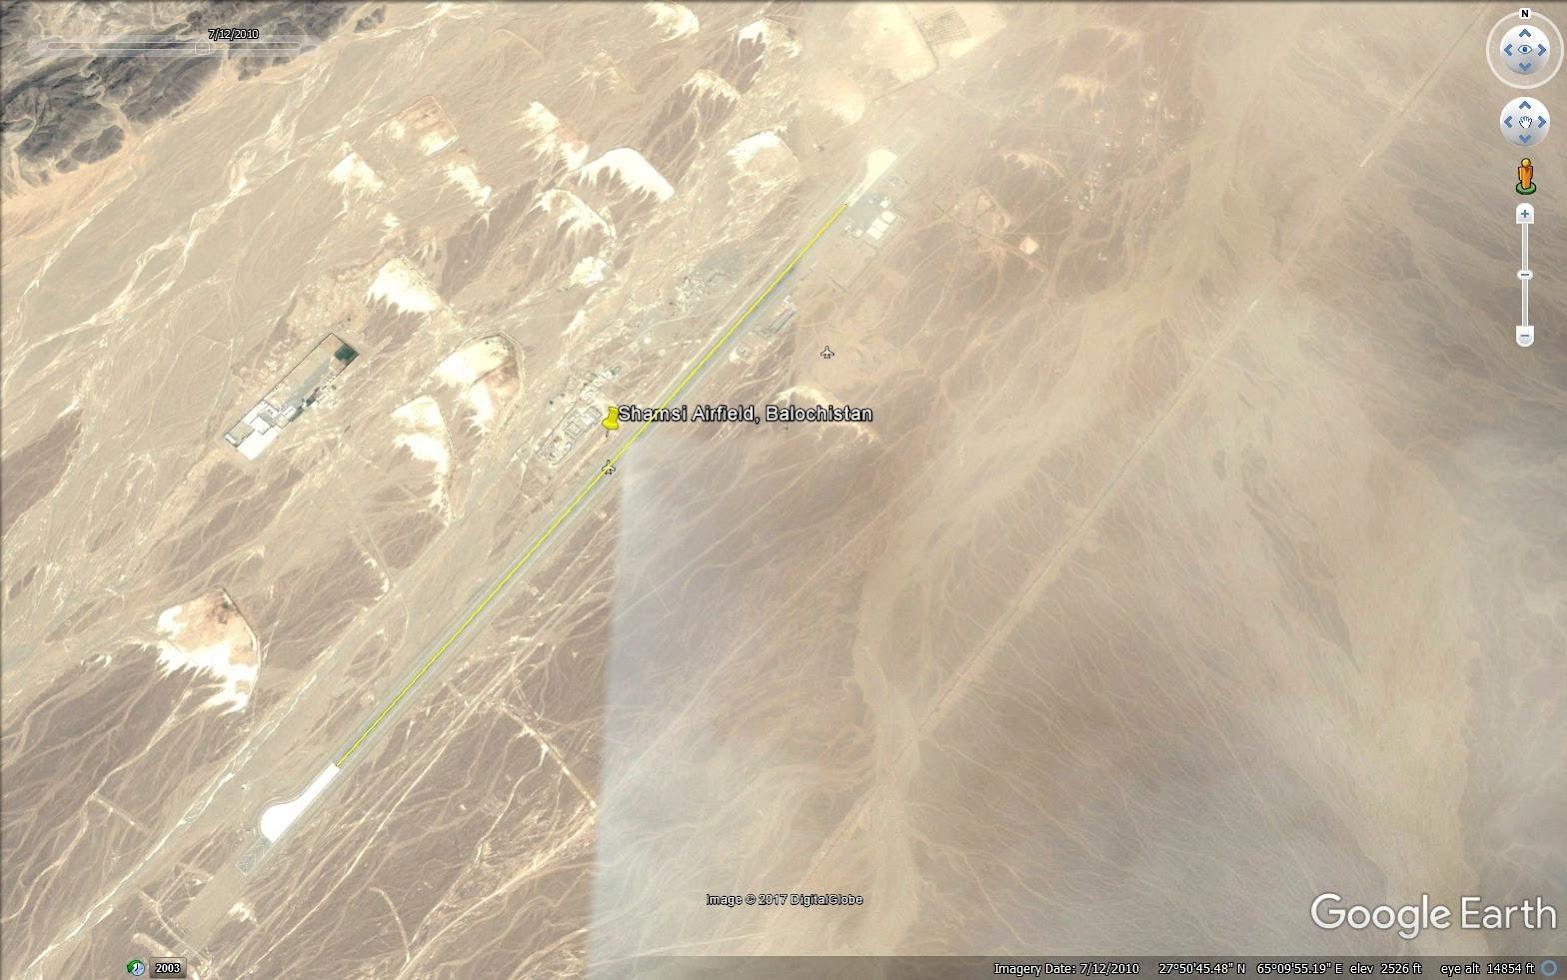 Shamsi Airfield, airstrip length 2.3 km